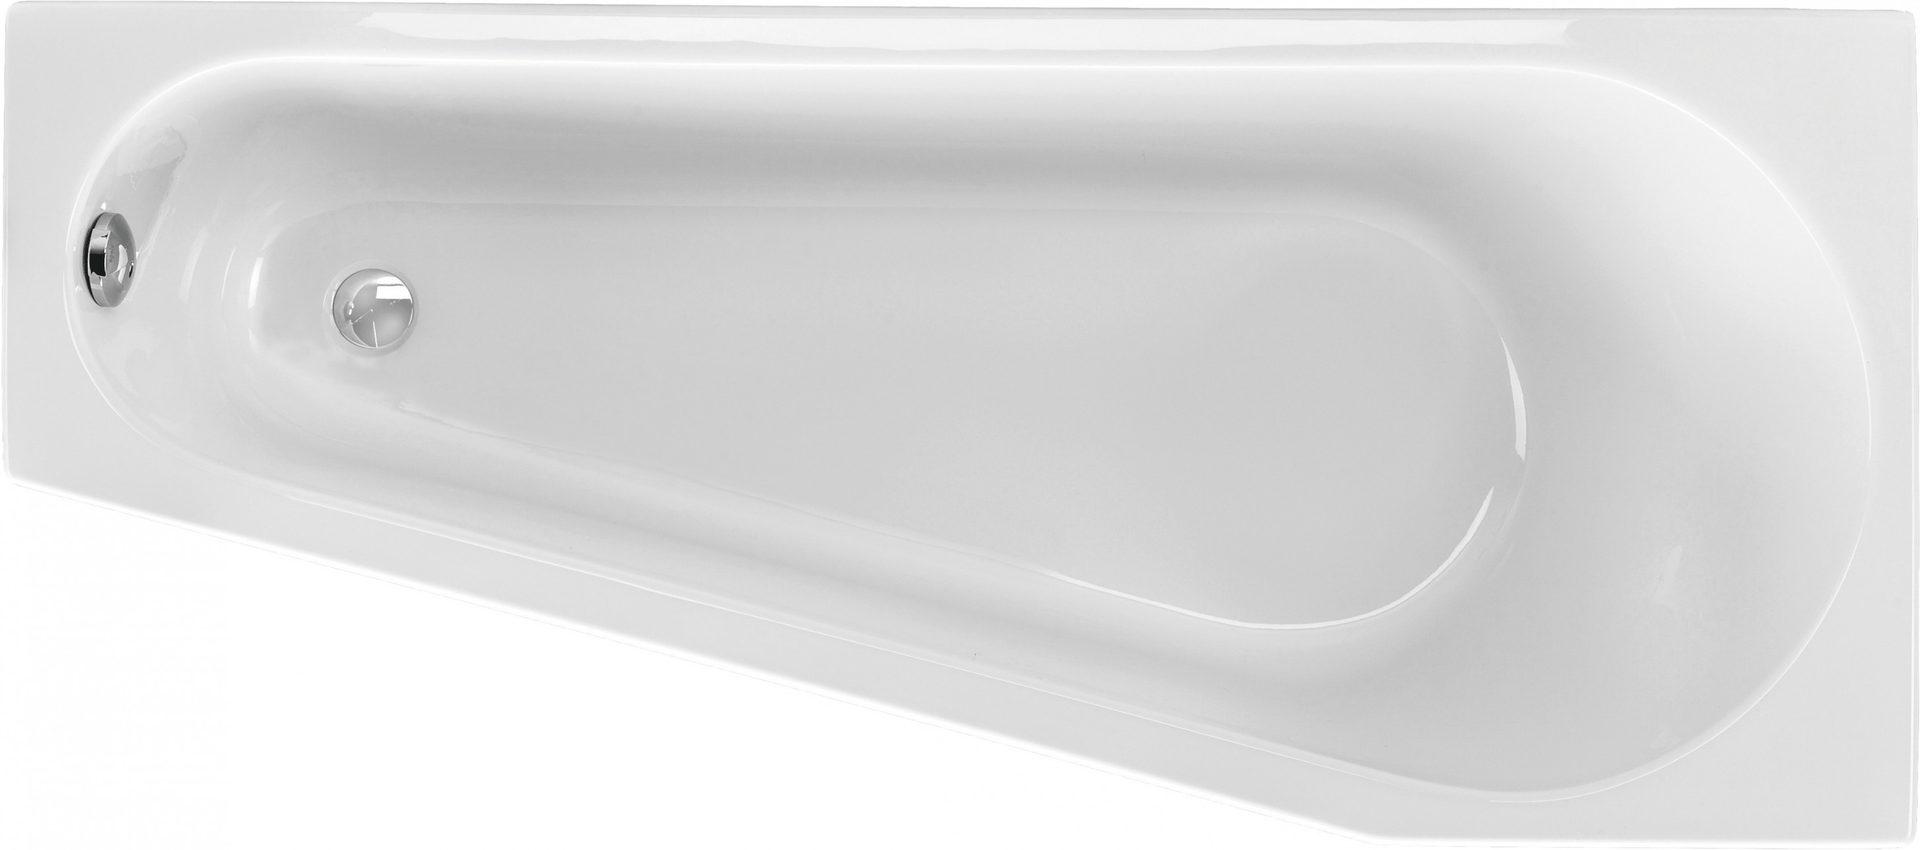 raumsparbadewanne 160 x 70 cm asymmetrisch trapez badewanne acryl. Black Bedroom Furniture Sets. Home Design Ideas